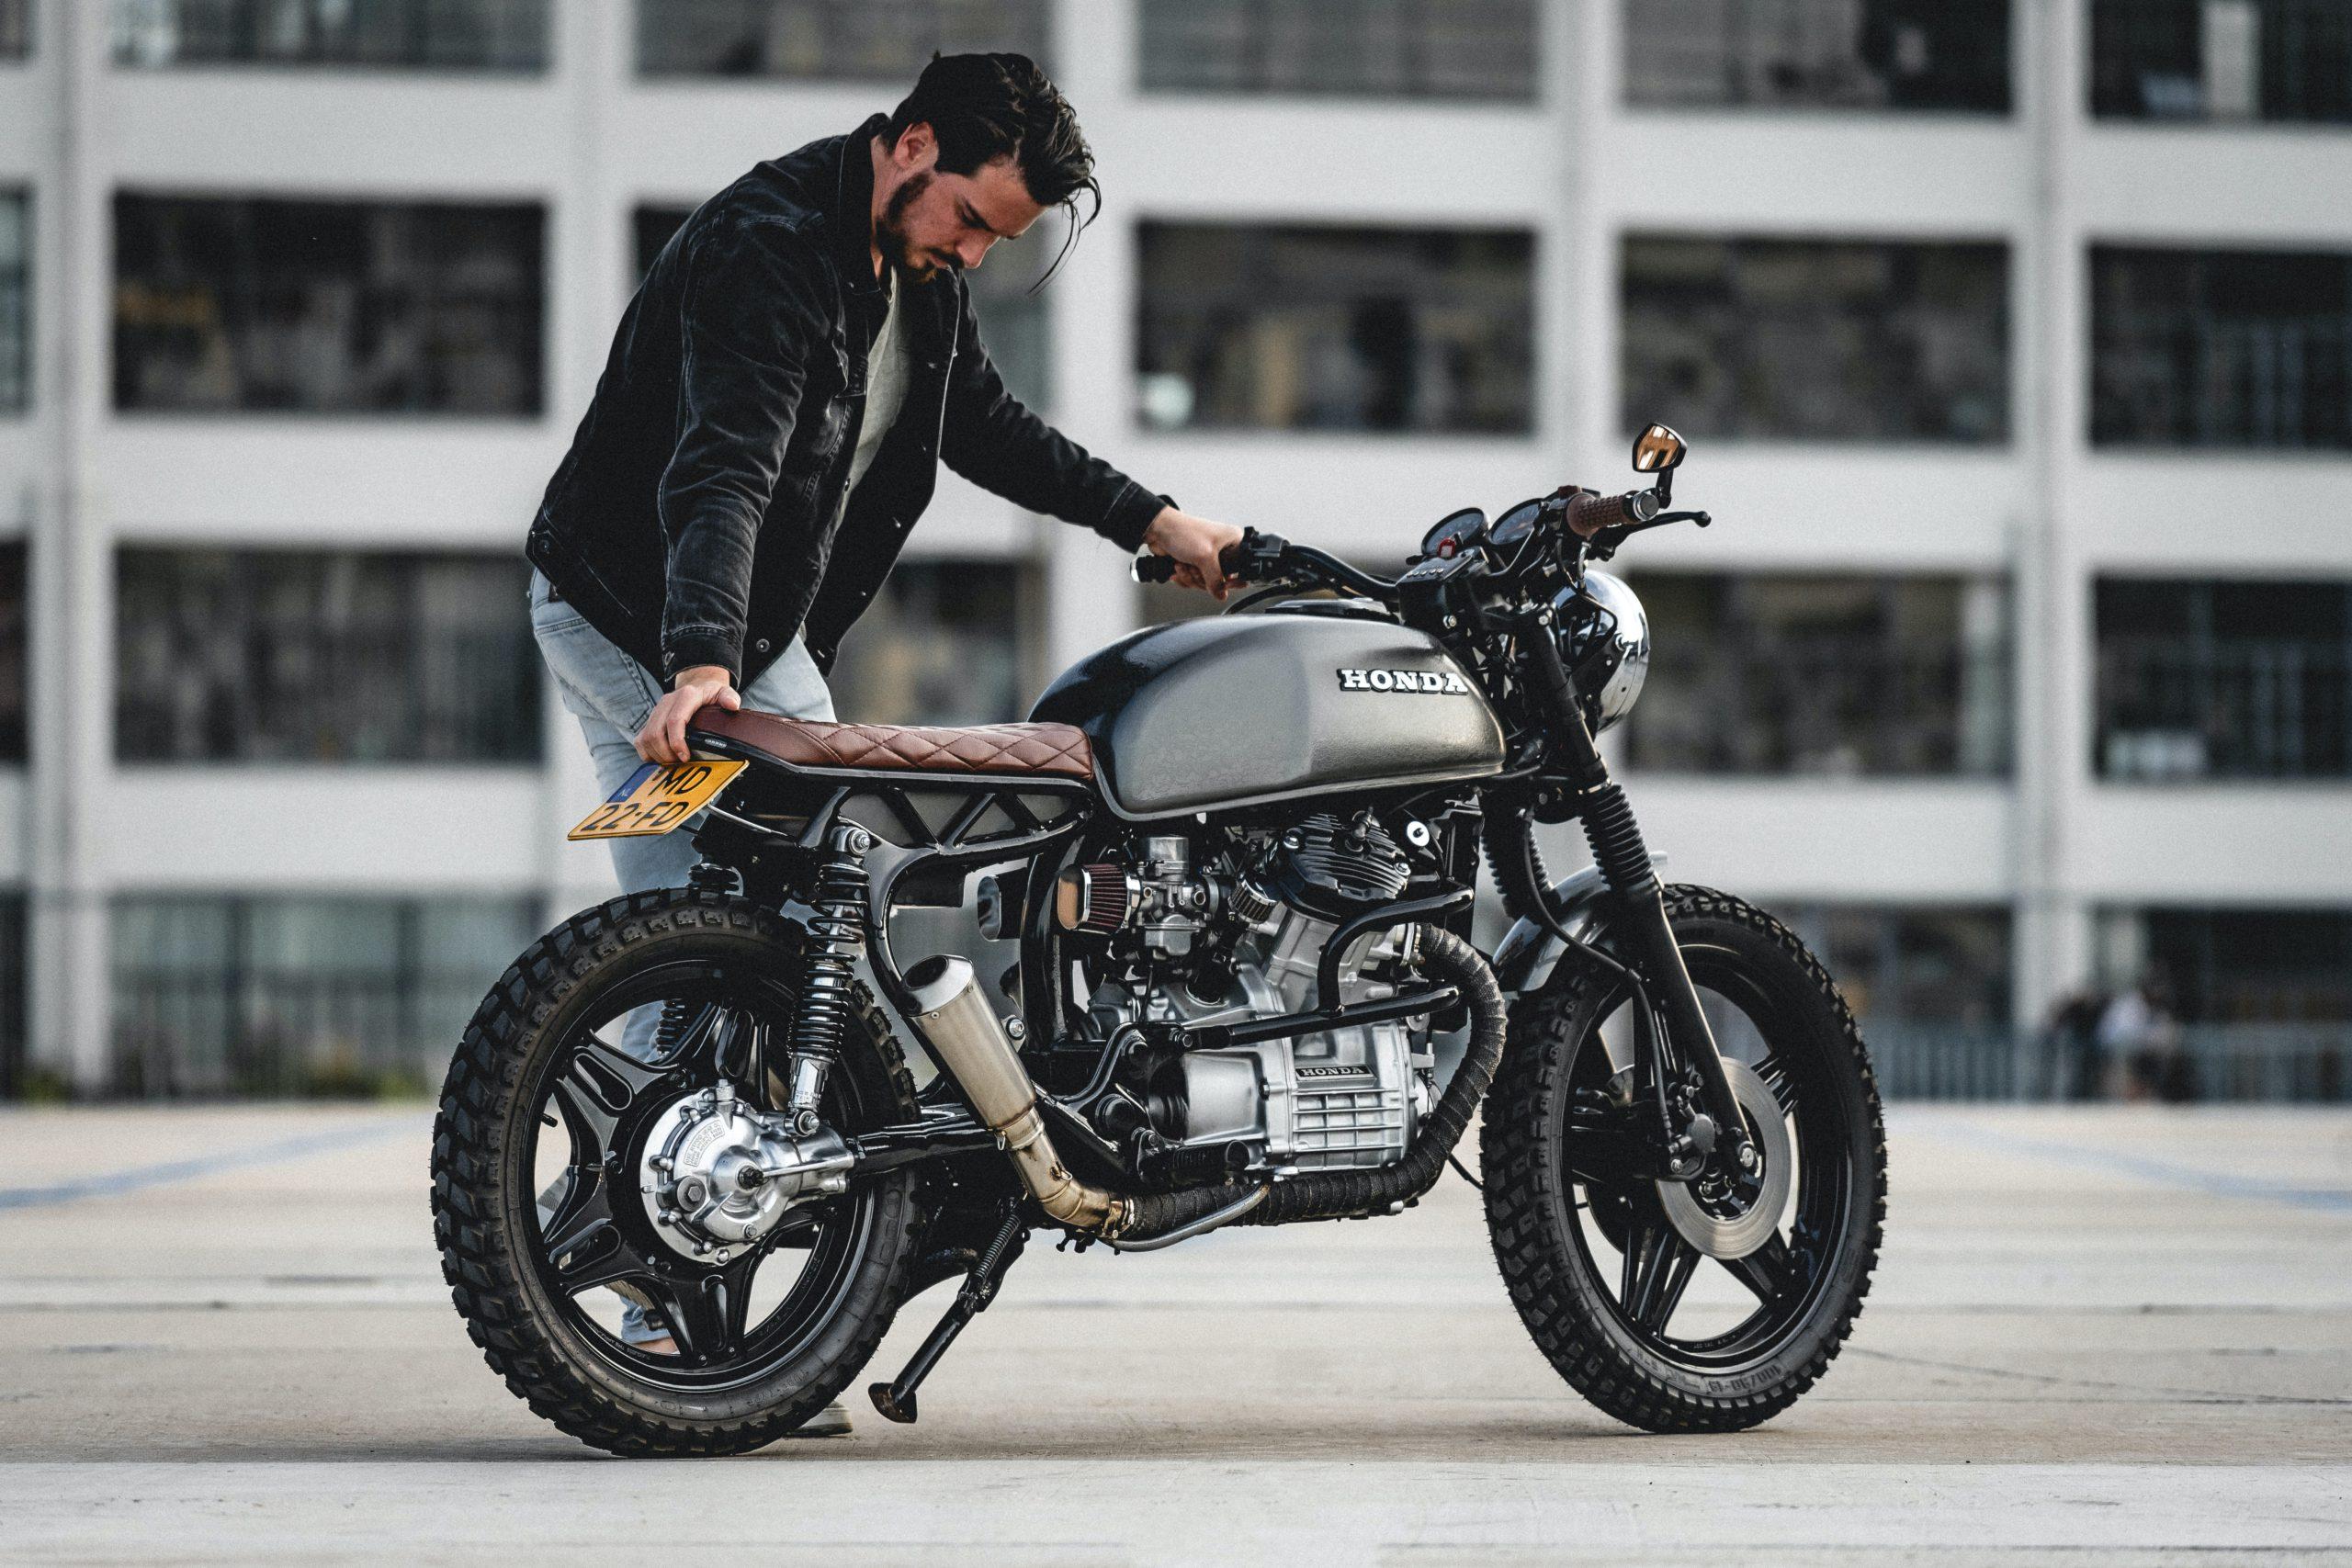 Что такое кастомайзинг мотоцикла?